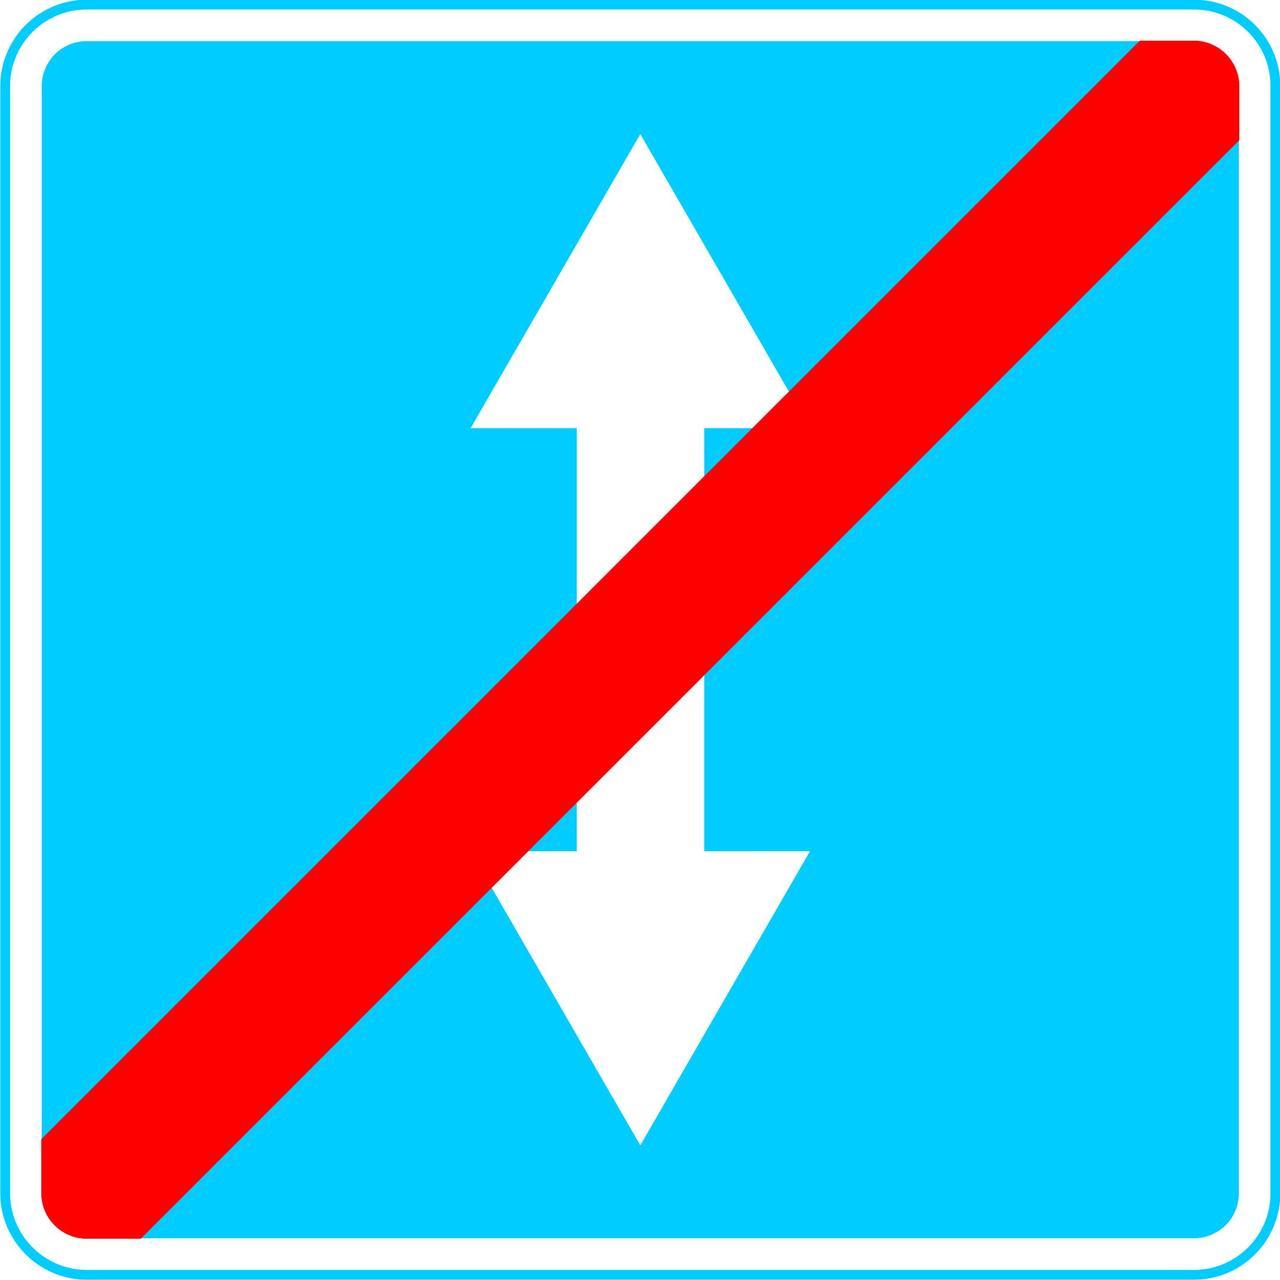 Знак 5.36 Кері қозғалыстың аяқталуы/ Конец реверсивного движения